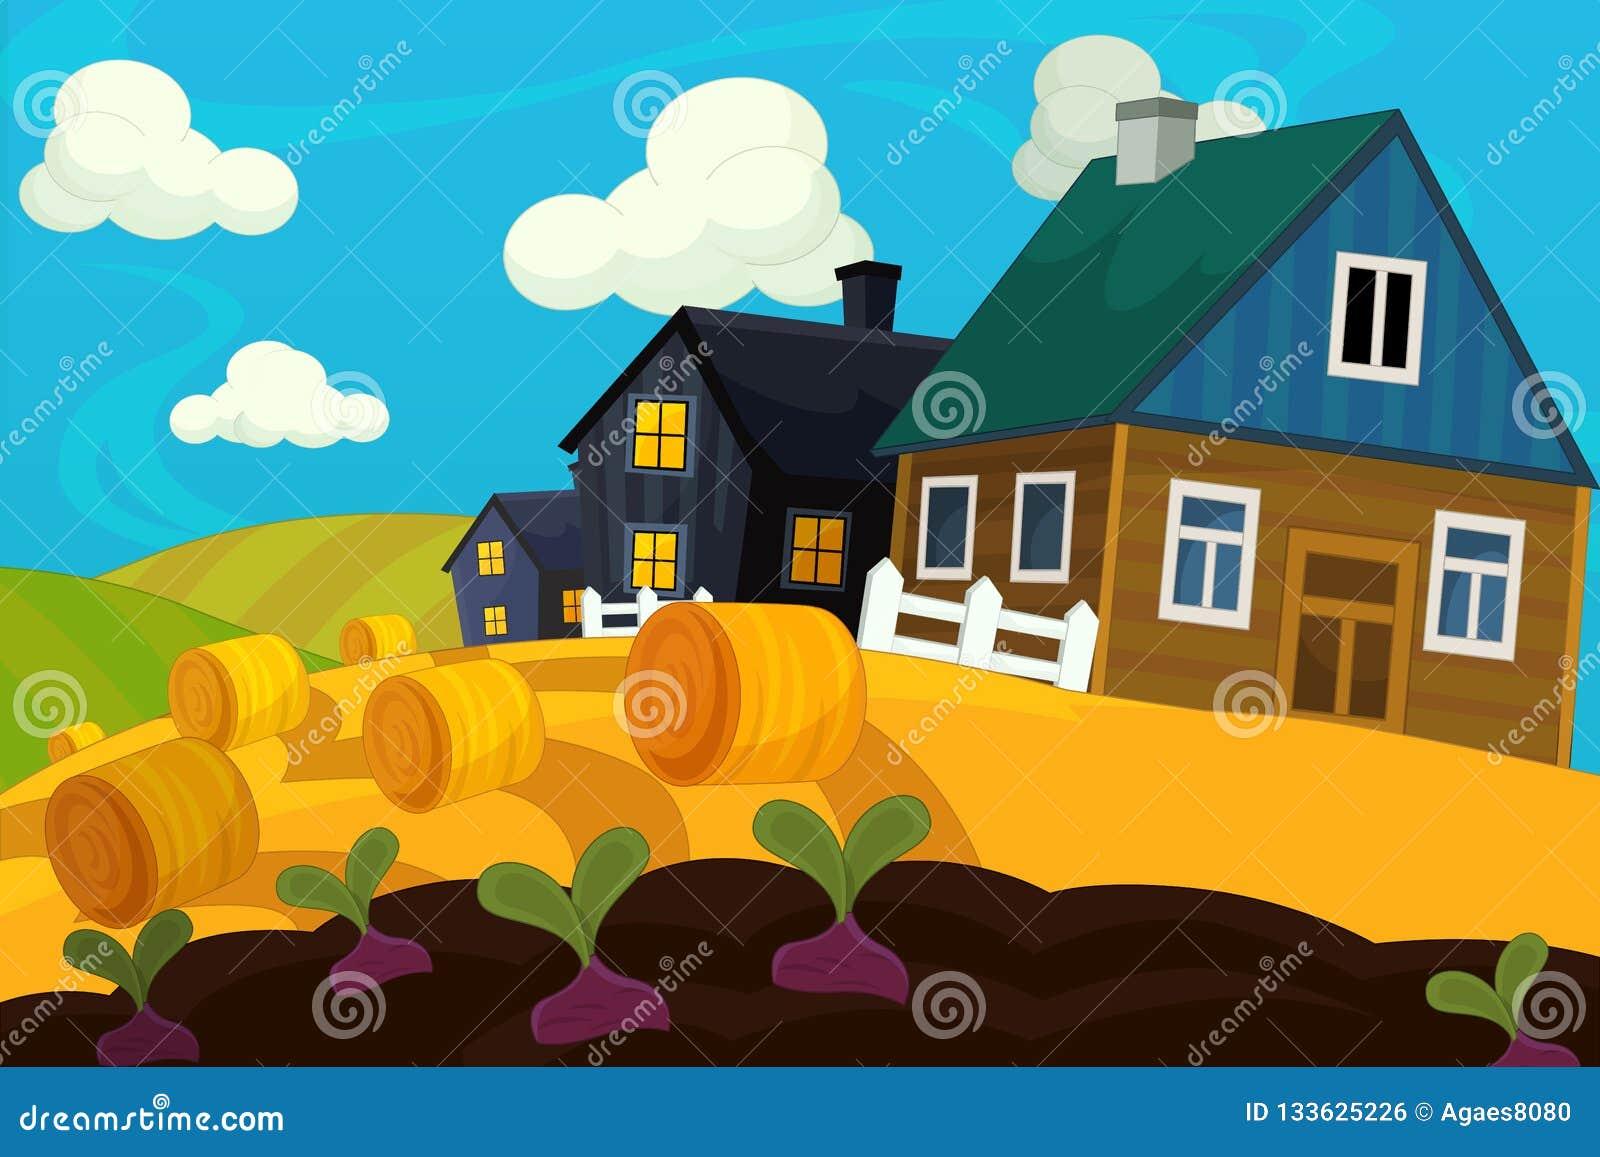 Cartoon farm scene - traditional village - for different usage